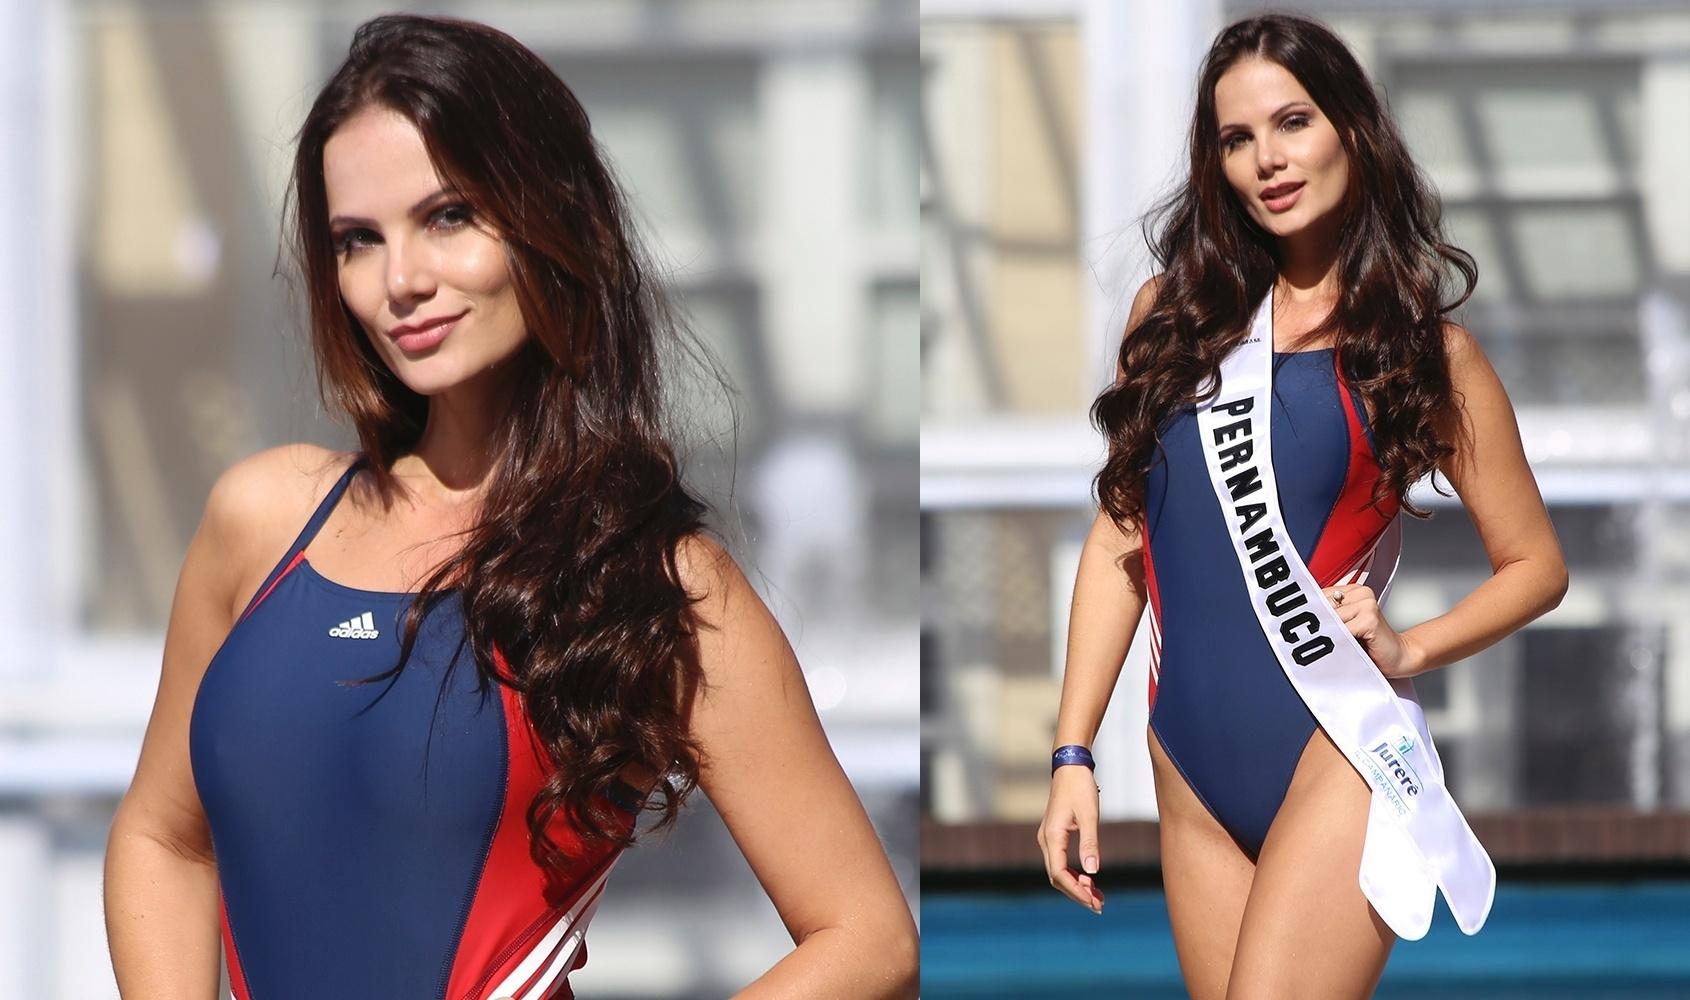 23.jun.2016 - PERNAMBUCO - Leidiane Vasconcelos, 26, estudante e modelo